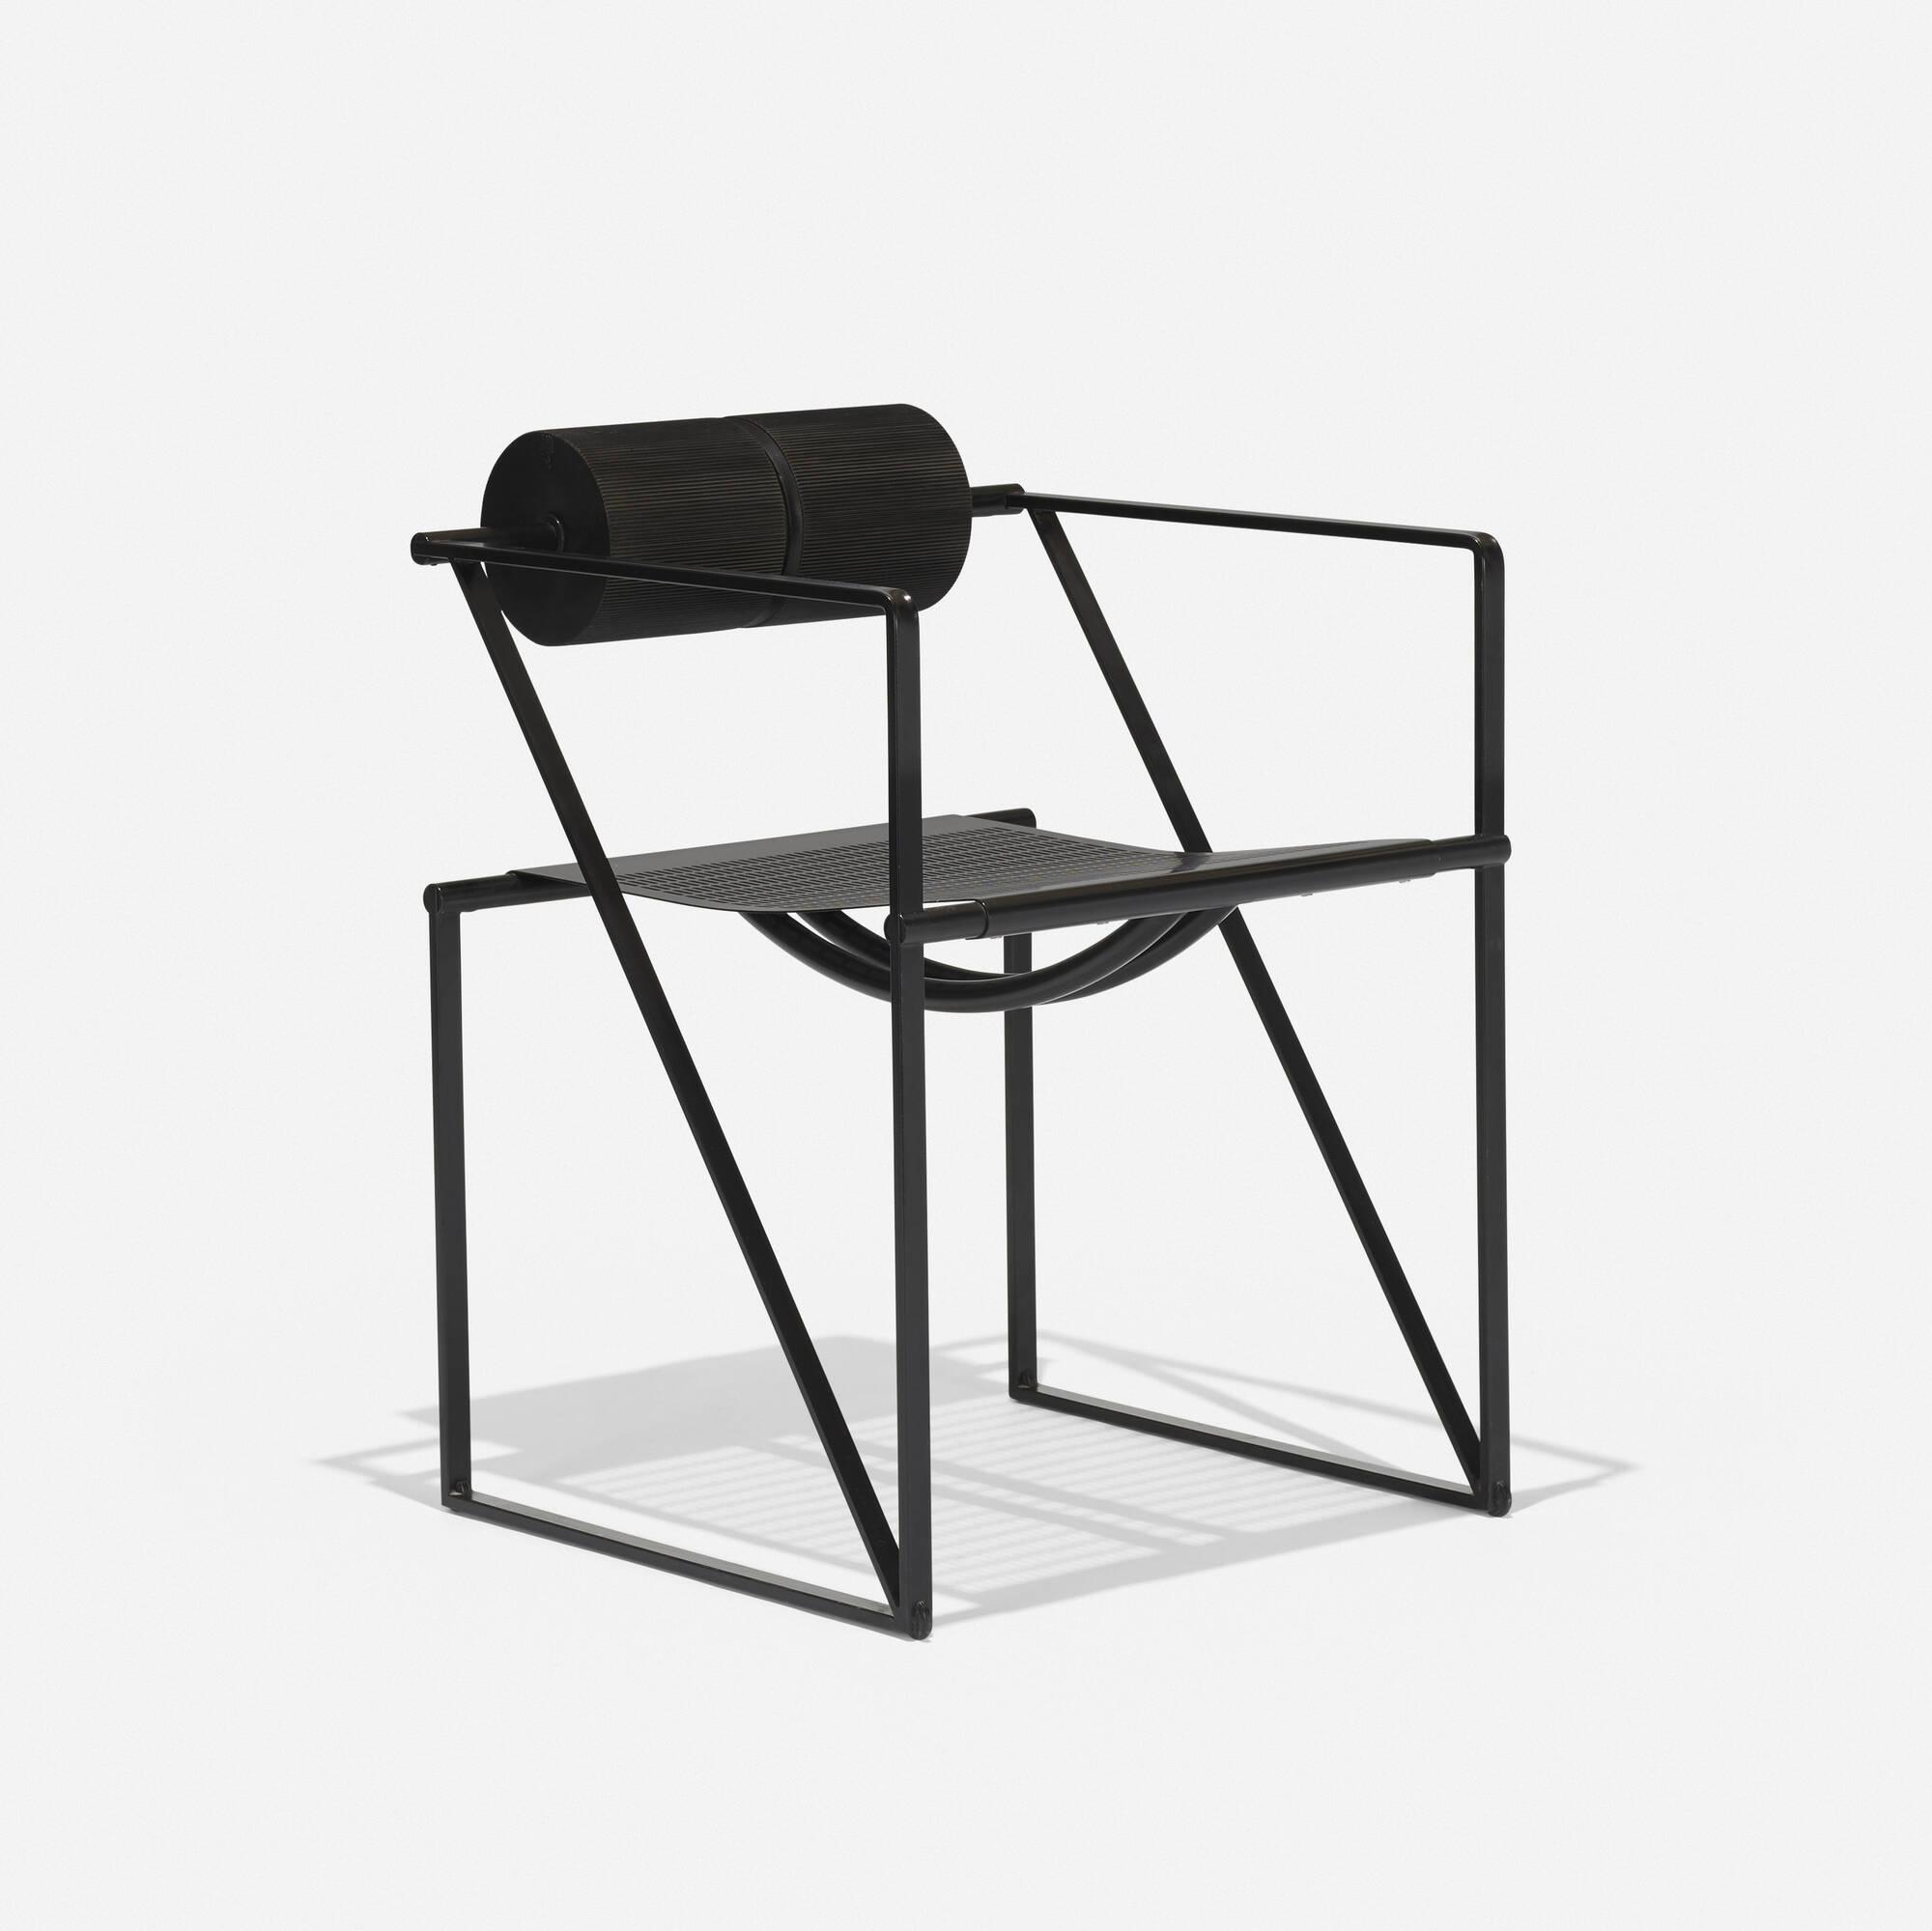 423: Mario Botta / Seconda armchair (1 of 4)